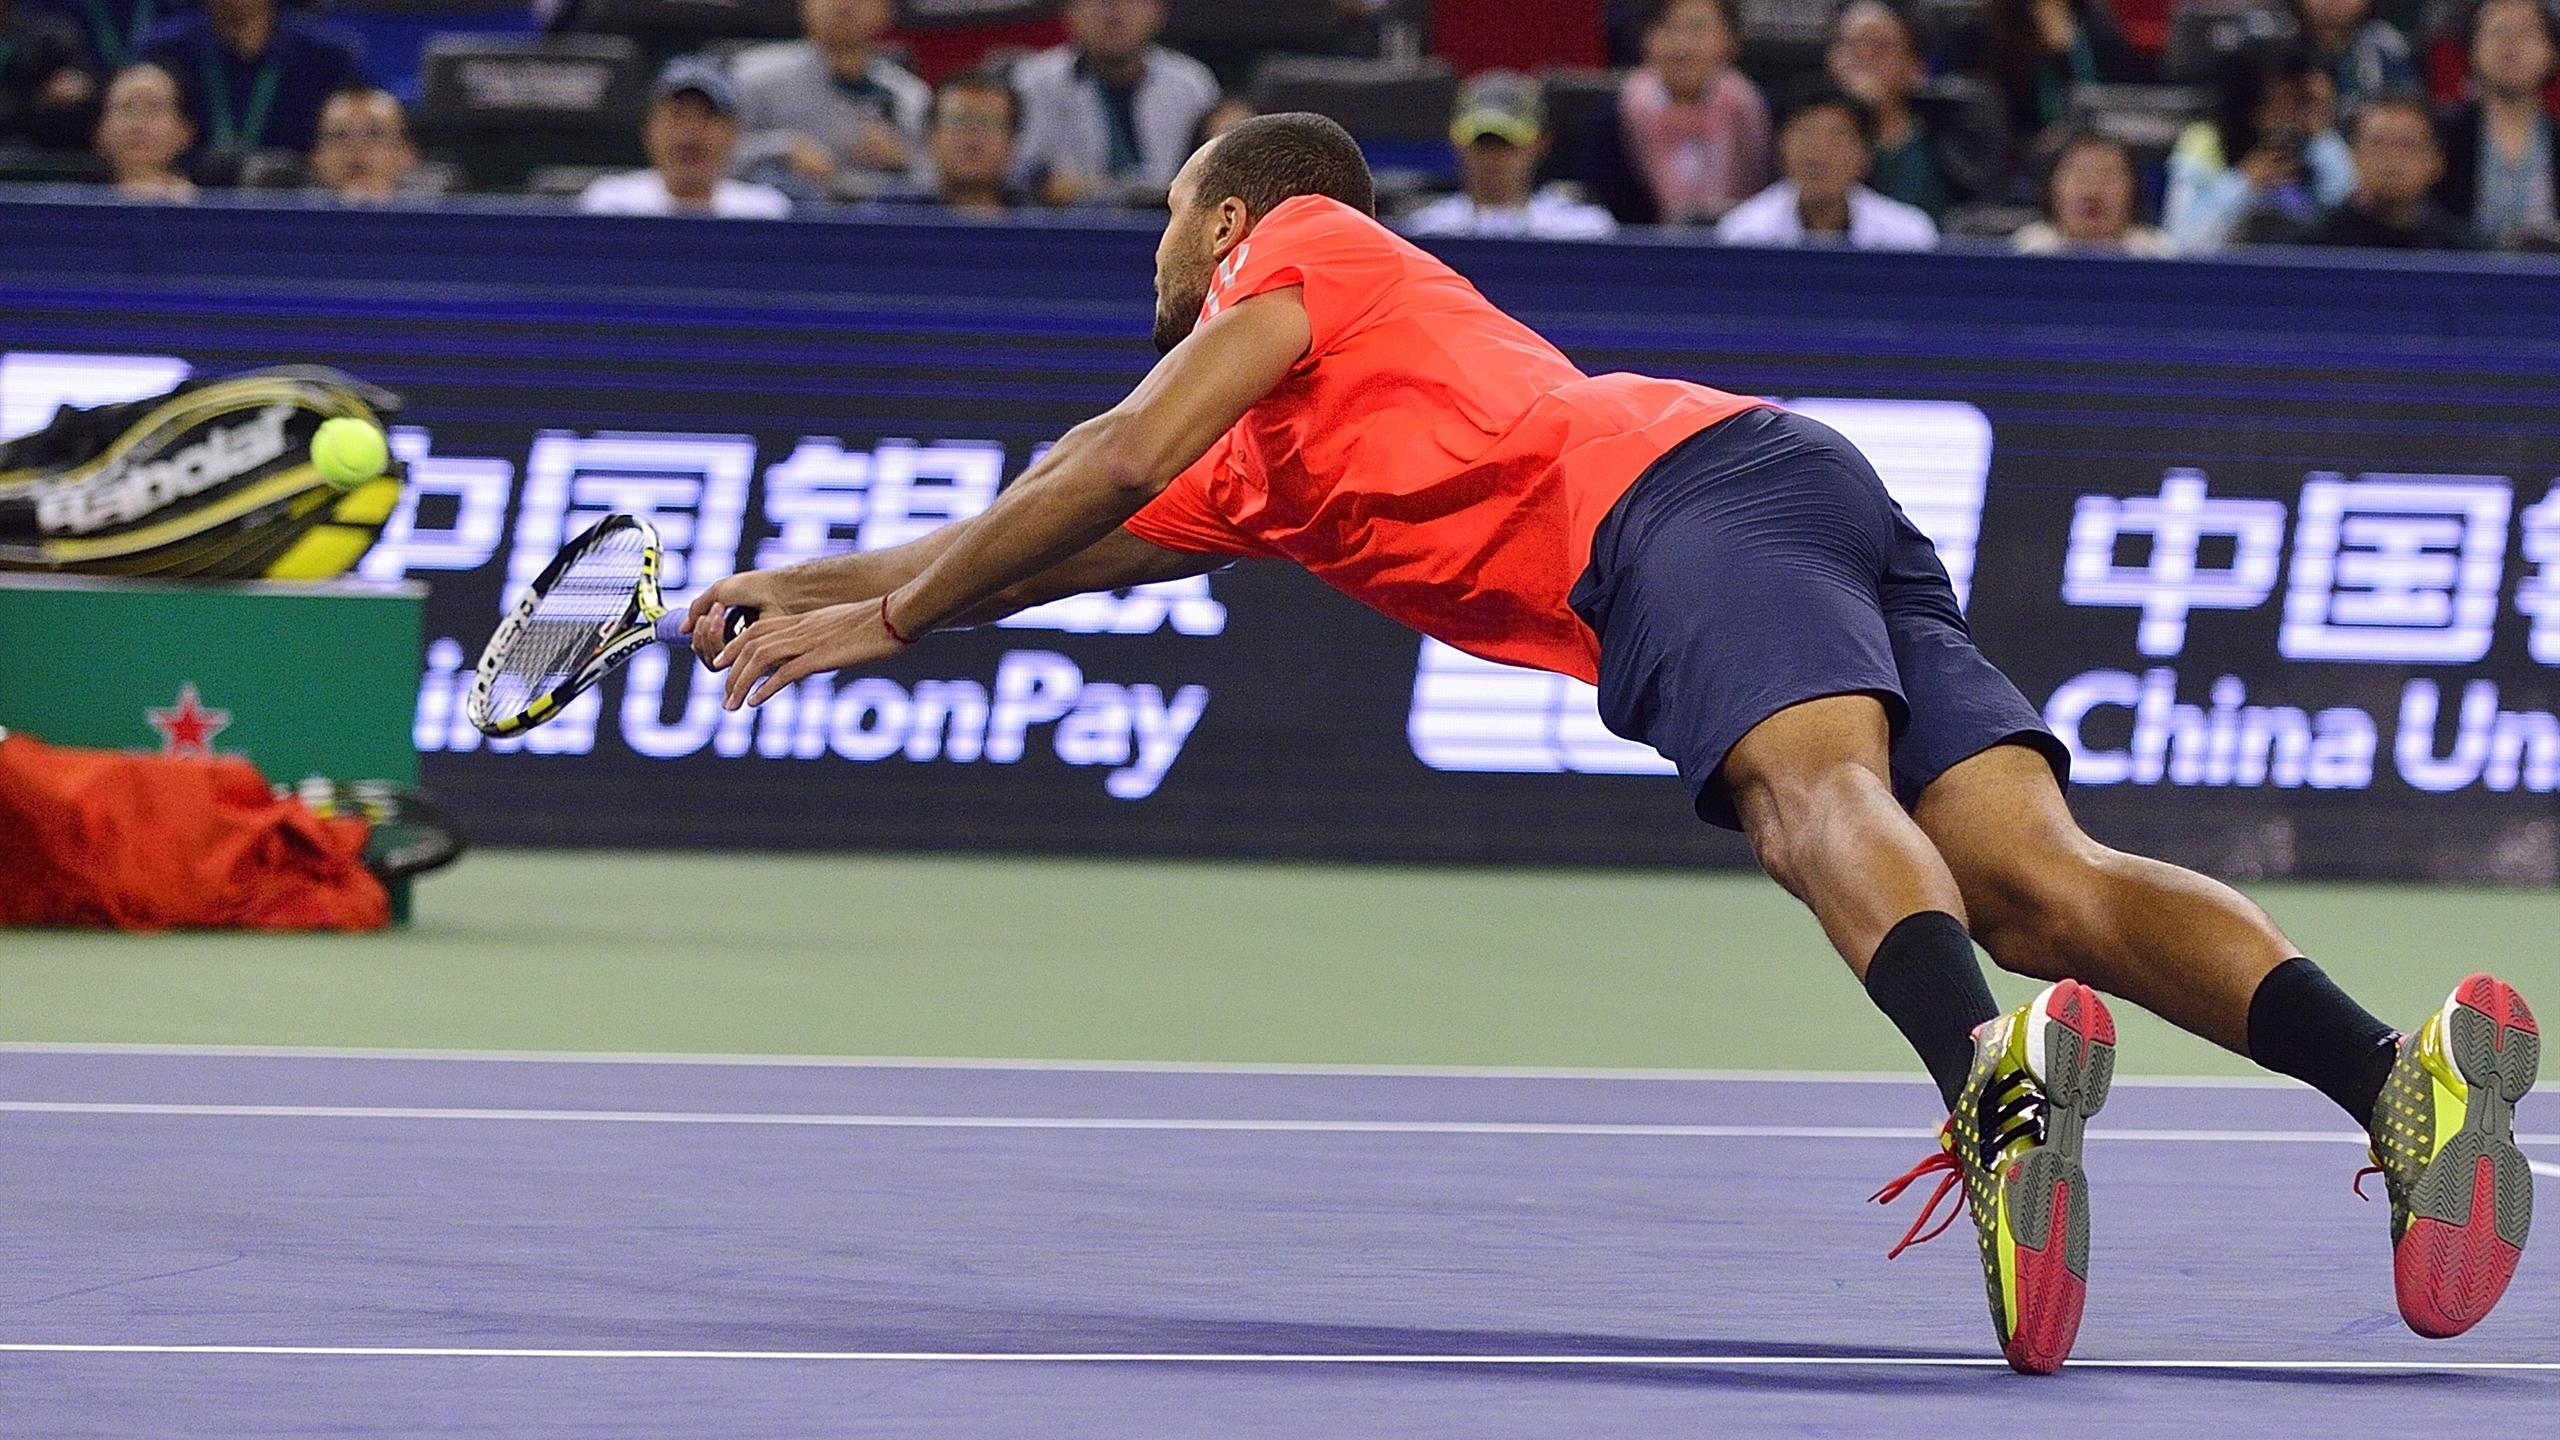 Oh le beau plongeon de Jo-Wilfried Tsonga contre Rafael Nadal.